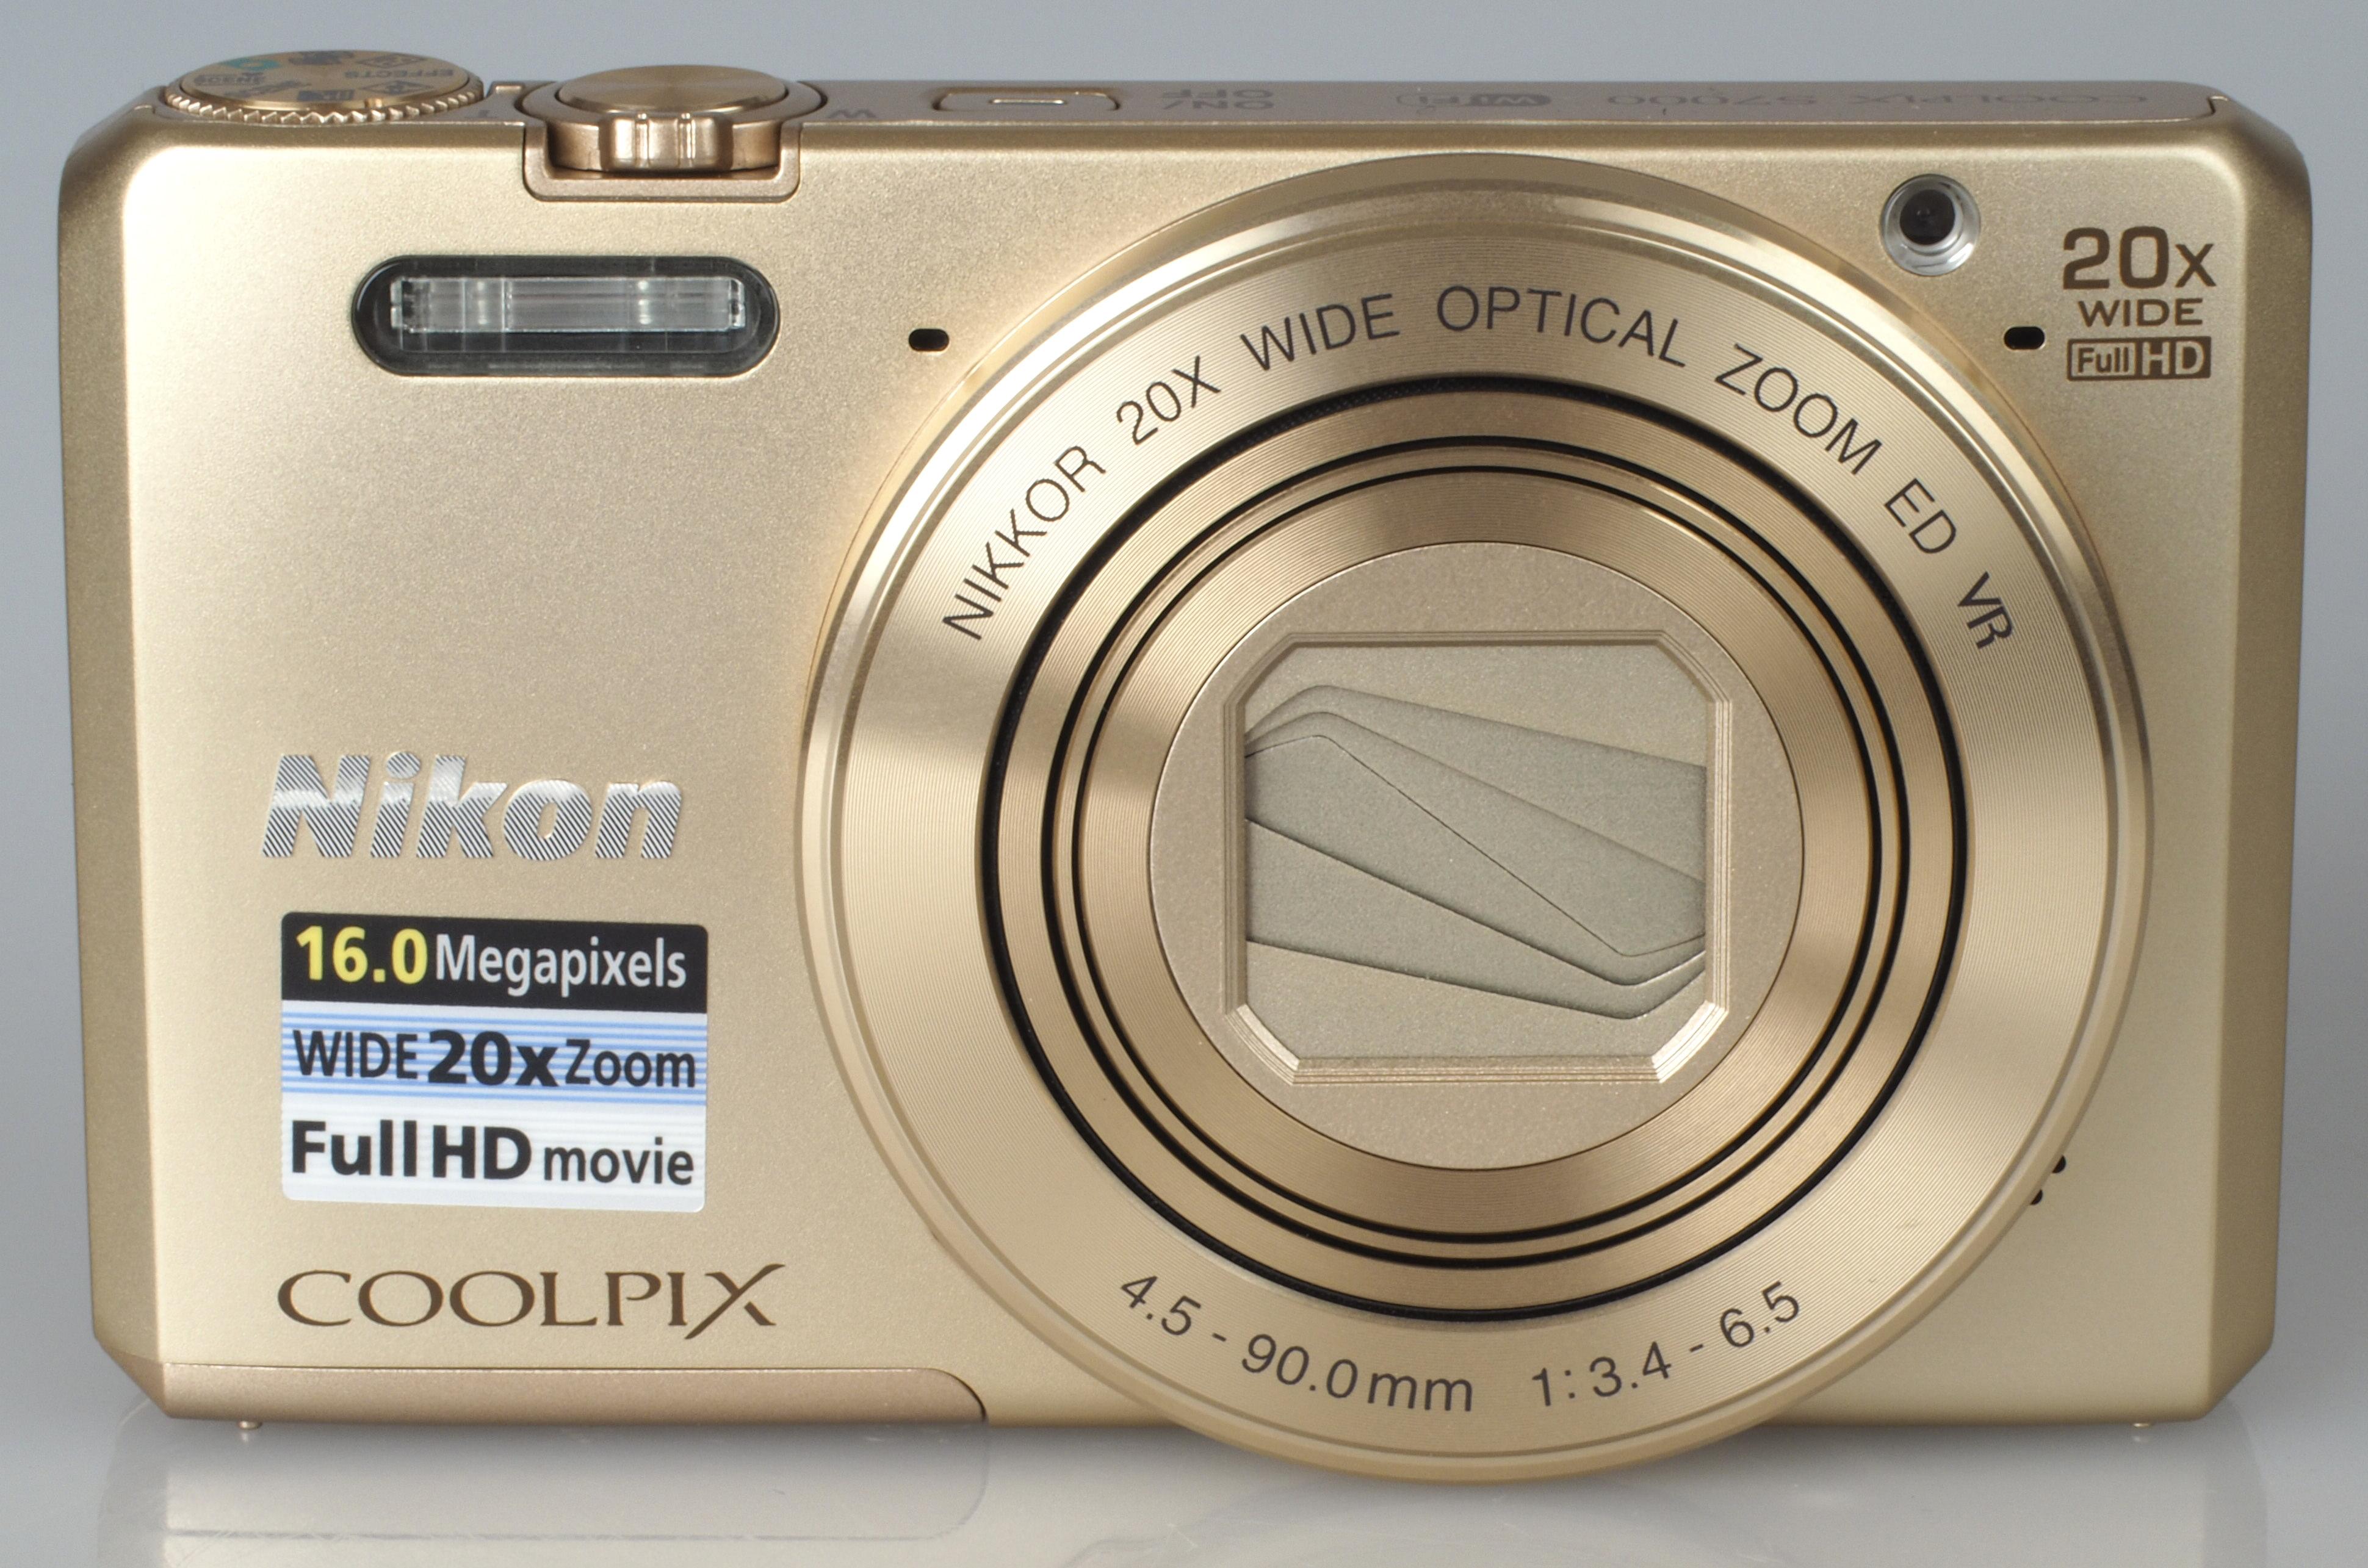 Nikon COOLPIX S7000 Camera Treiber Windows 7